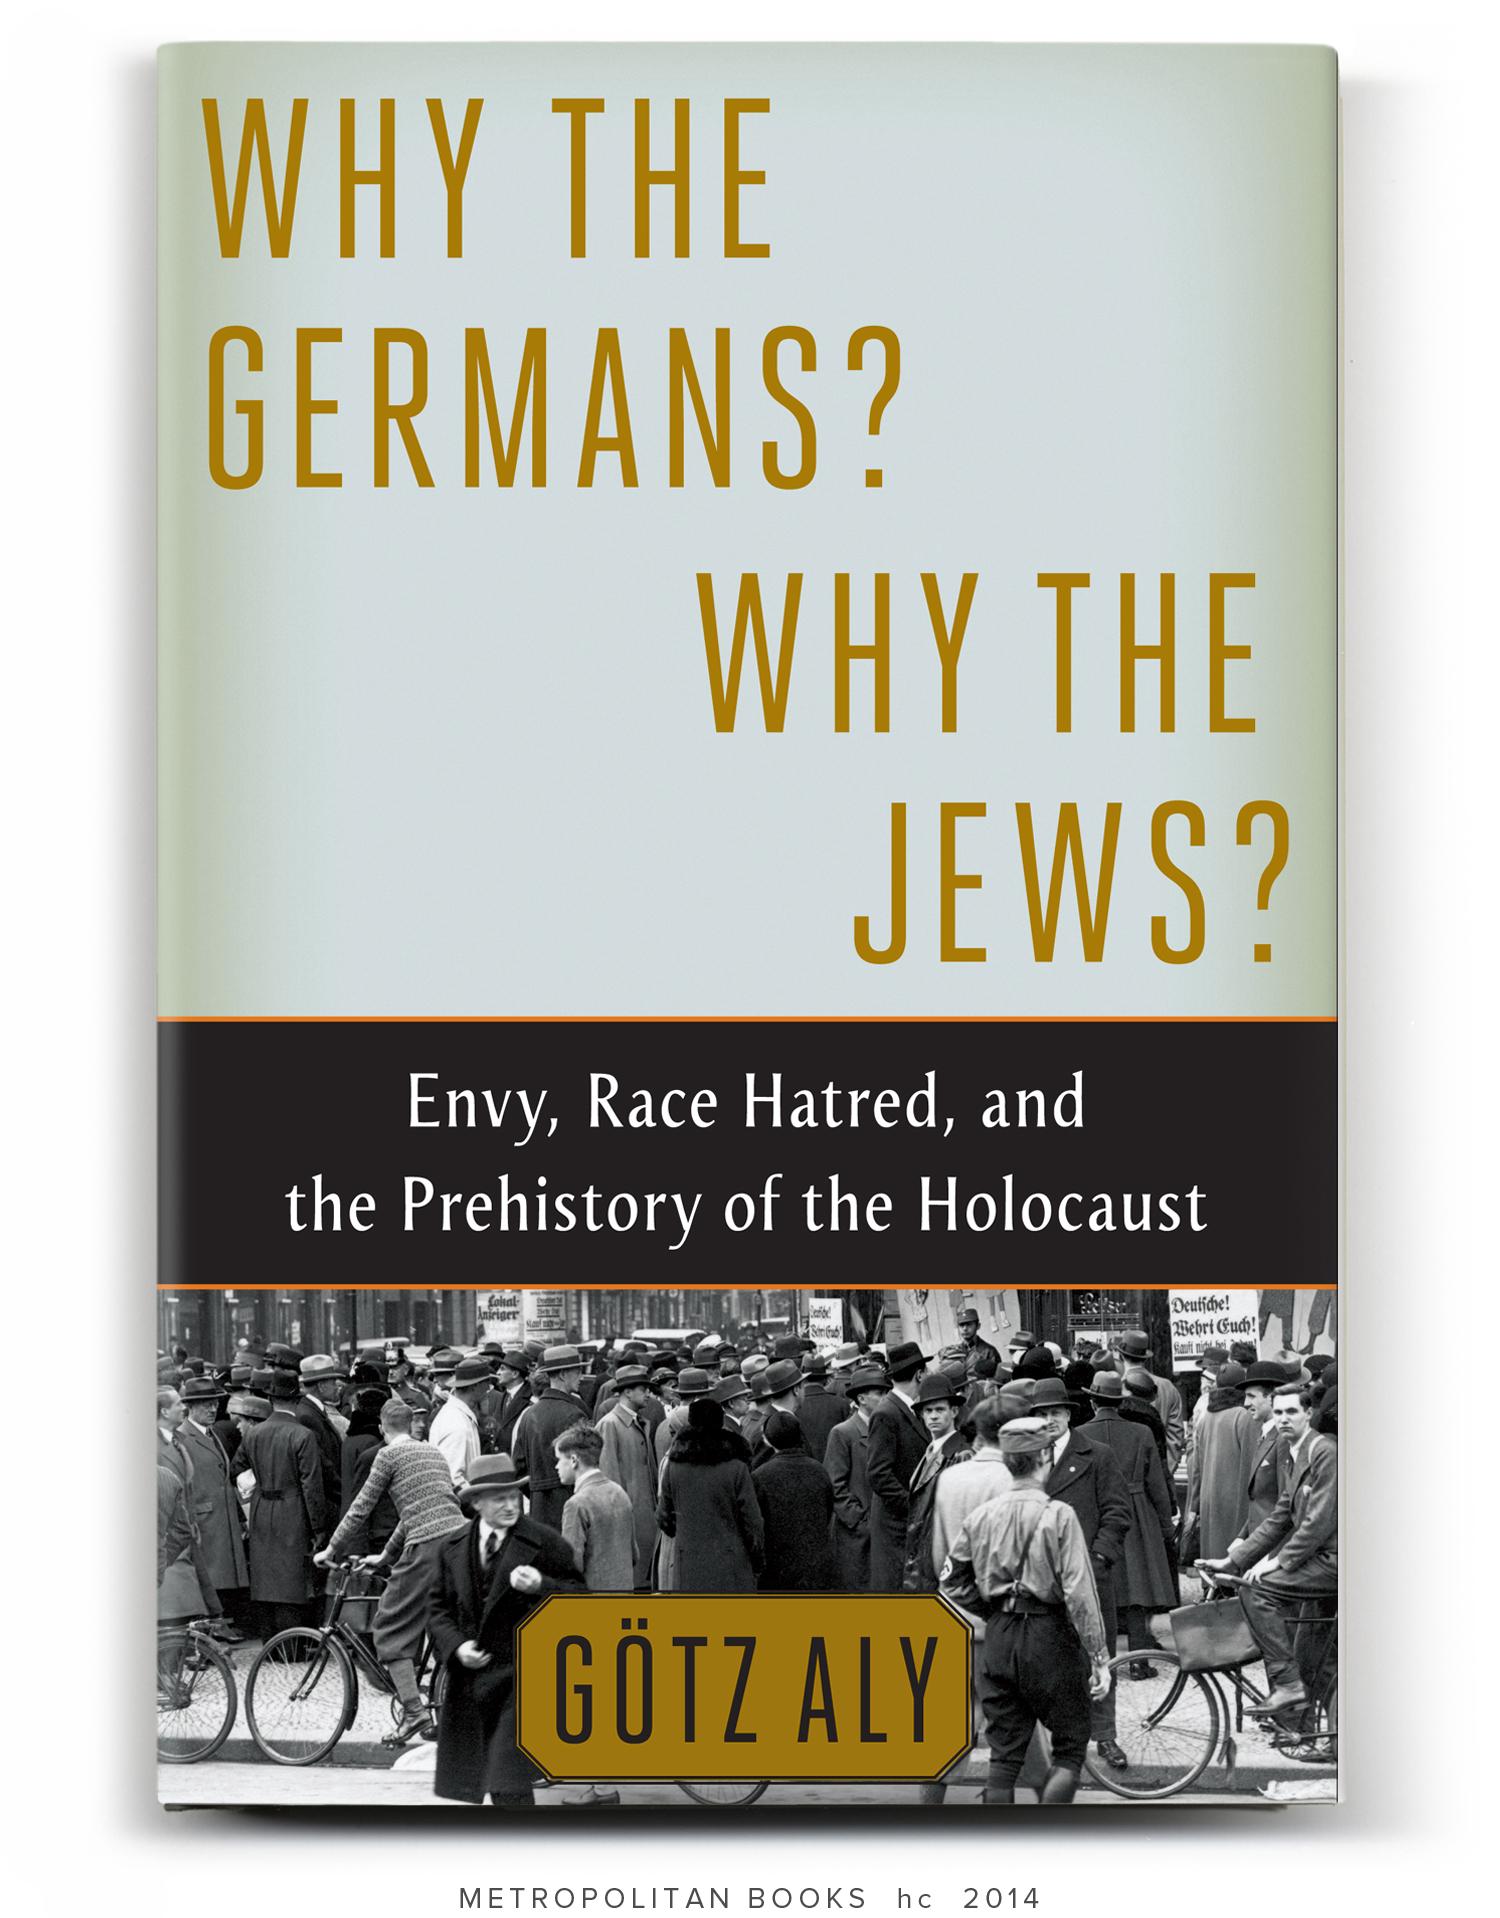 WHY-THE-GERMANS-hc-ss6.jpg